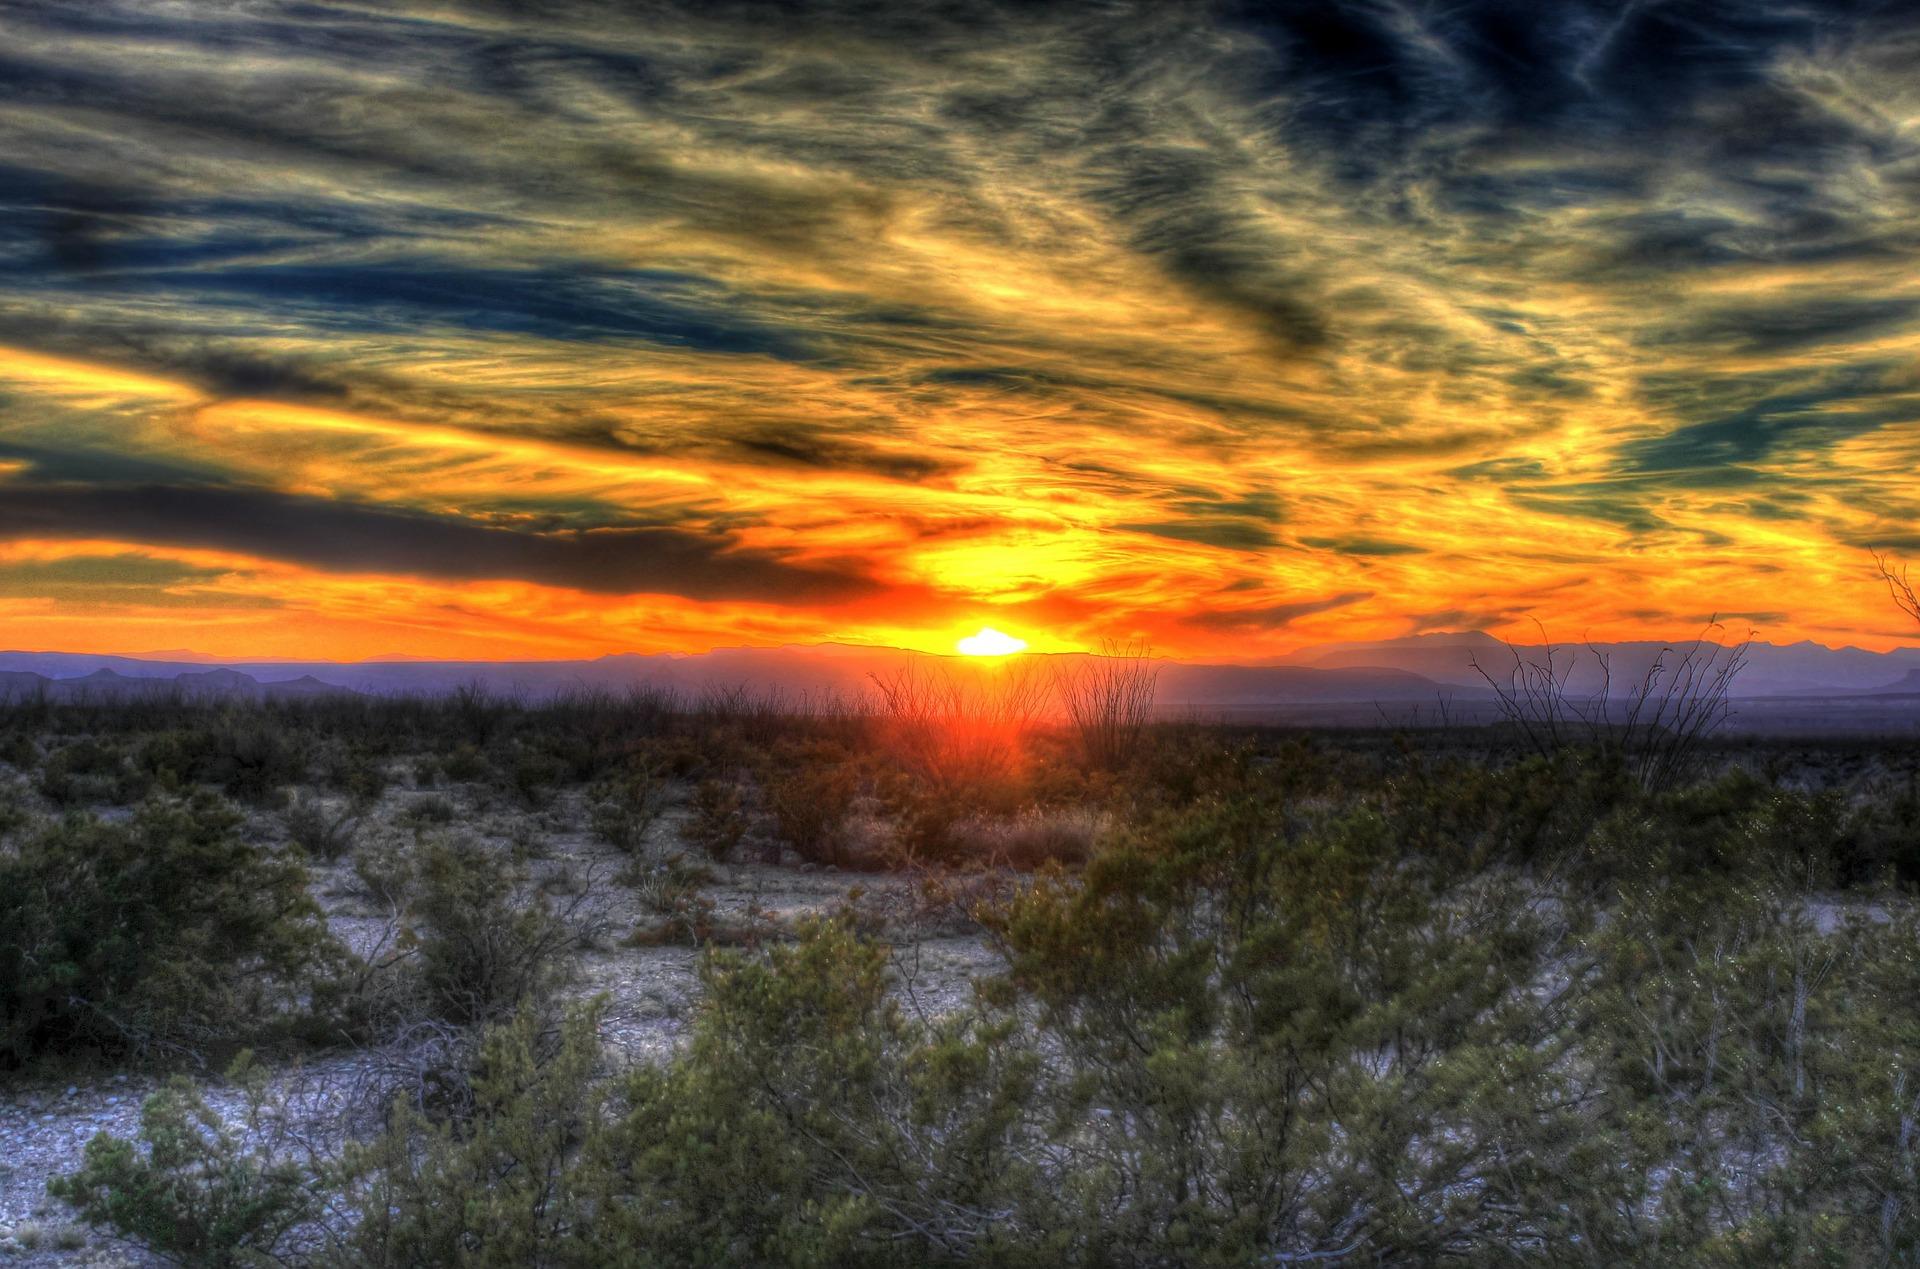 sunset-258930_1920.jpg